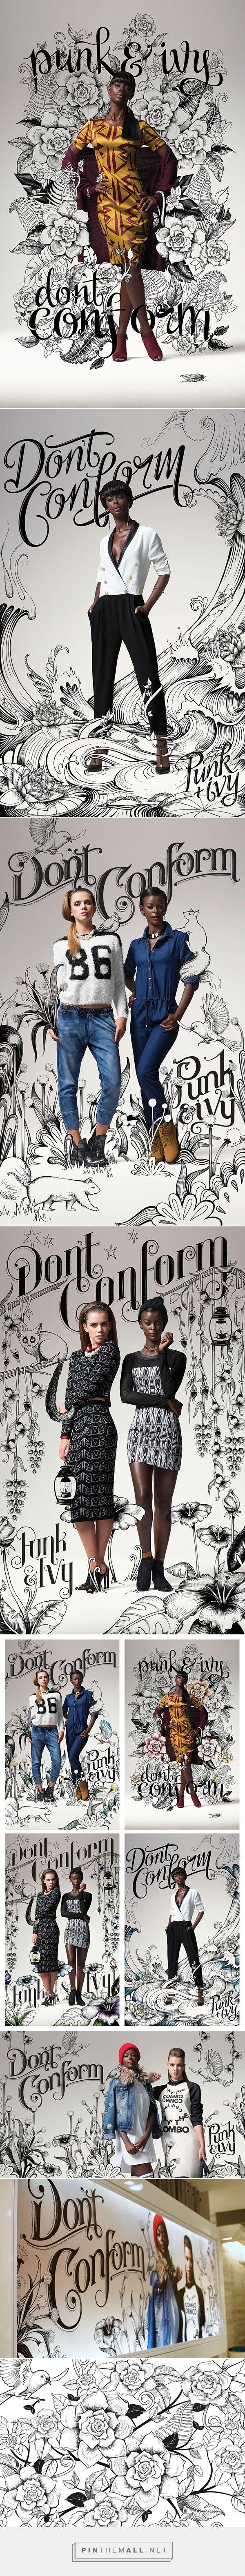 advertising set | LEGiT Don't Conform Campaign on SCAD Portfolios - Dani Loureiro